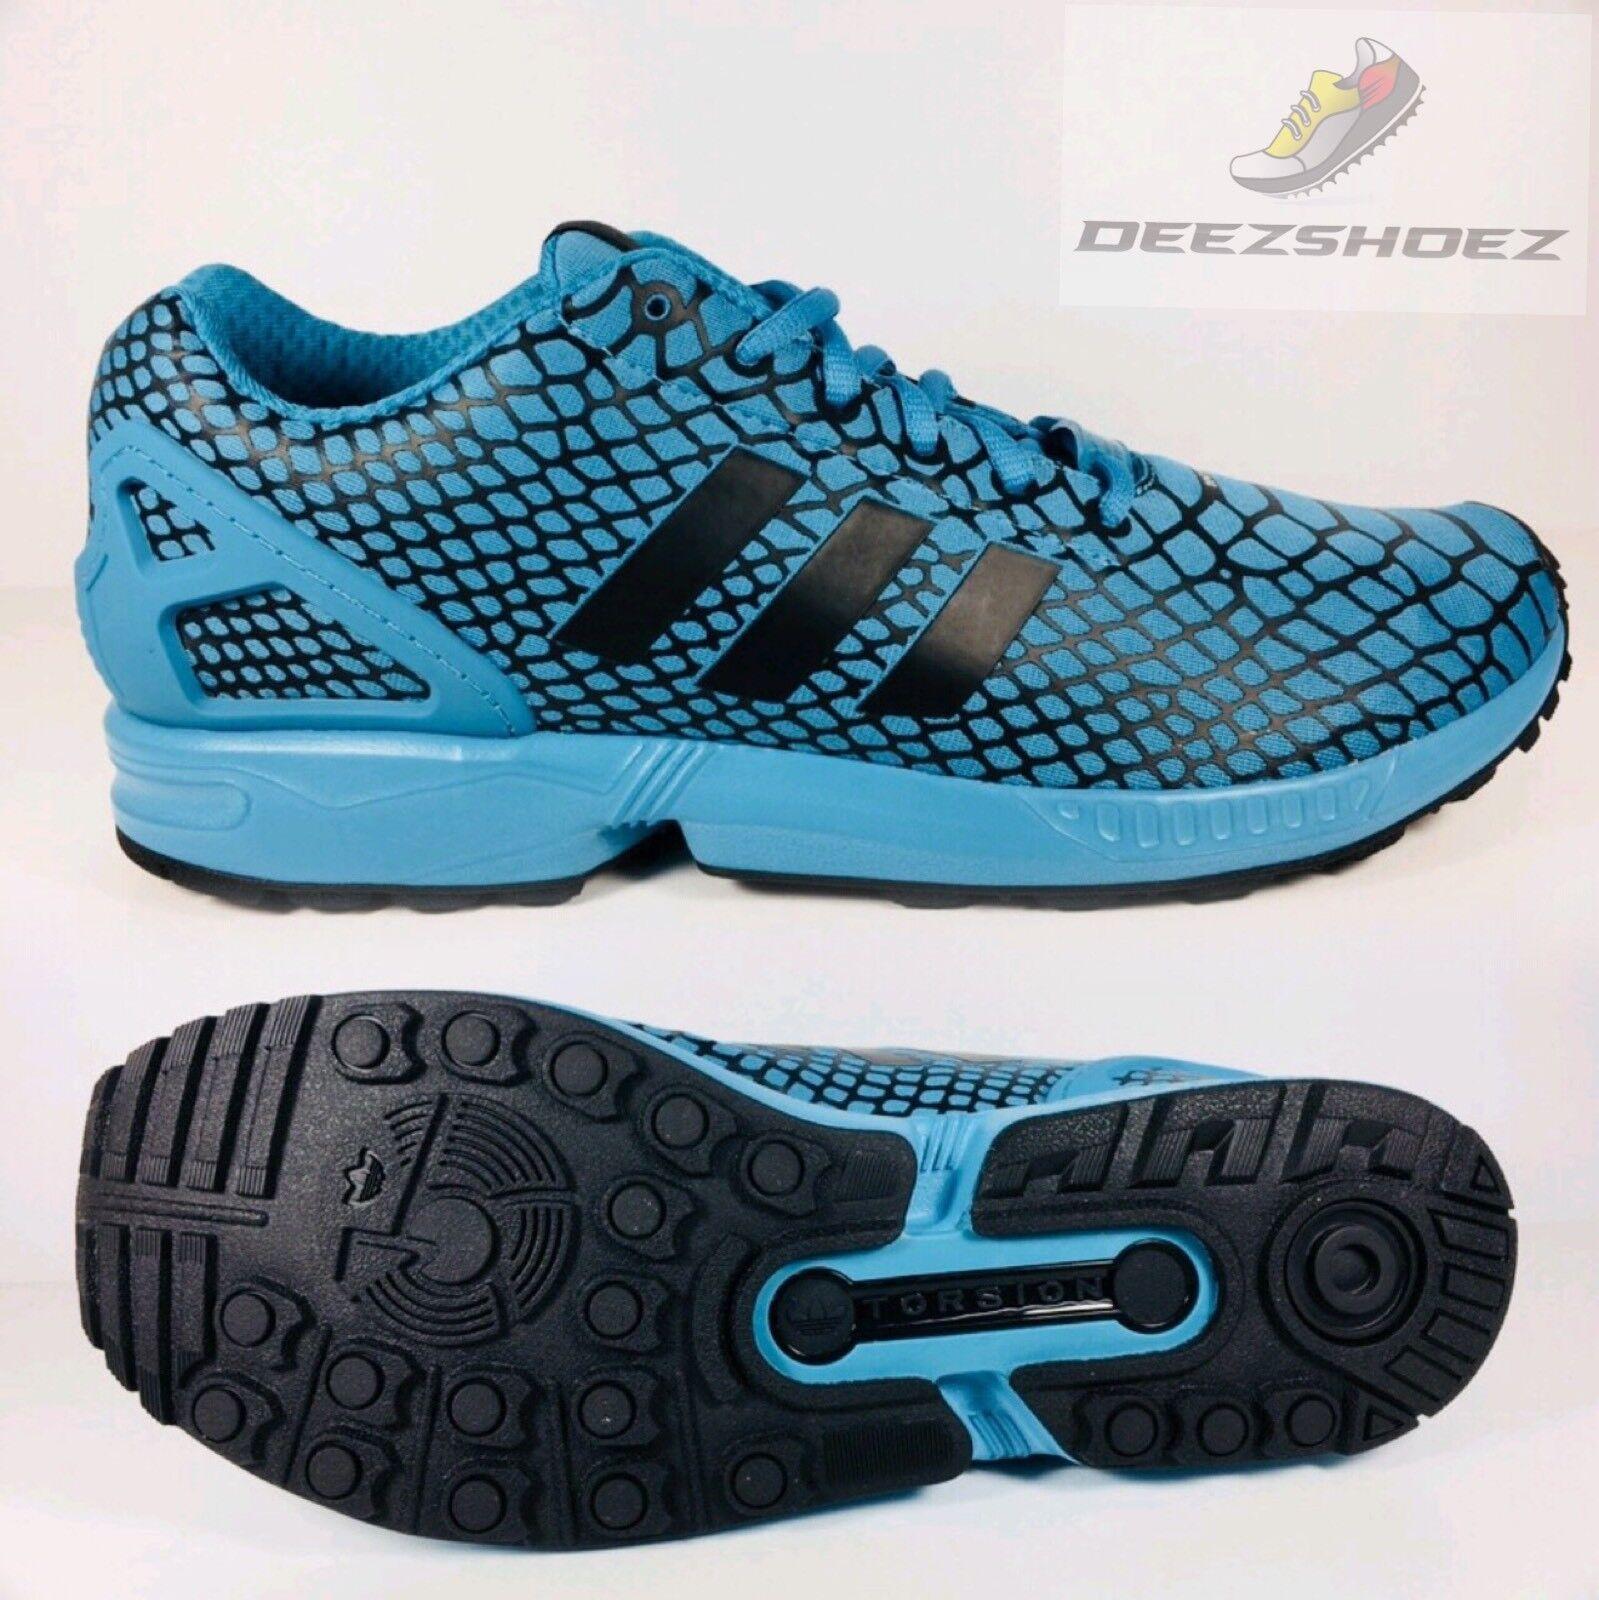 Adidas Mens ZX Flux Techfit Sky Blue Mens Adidas S79066 US Size 11.5 e09b1f